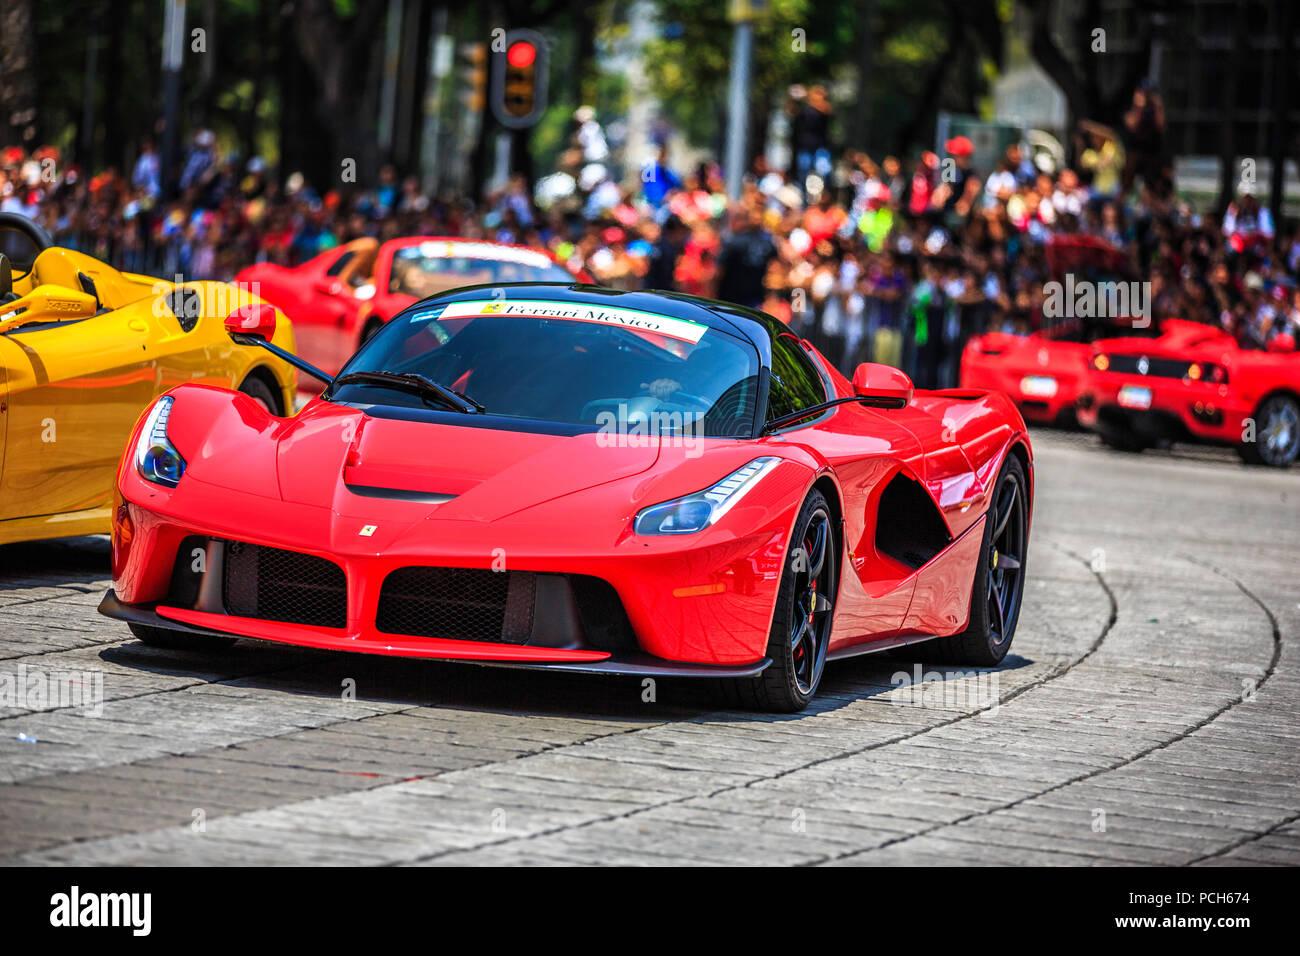 Mexico City Mexico July 08 2015 Ferrari La Ferrari Part Of The Ferraris Car Parade At The Scuderia Ferrari Street Demo By Telcel Infinitum Stock Photo Alamy